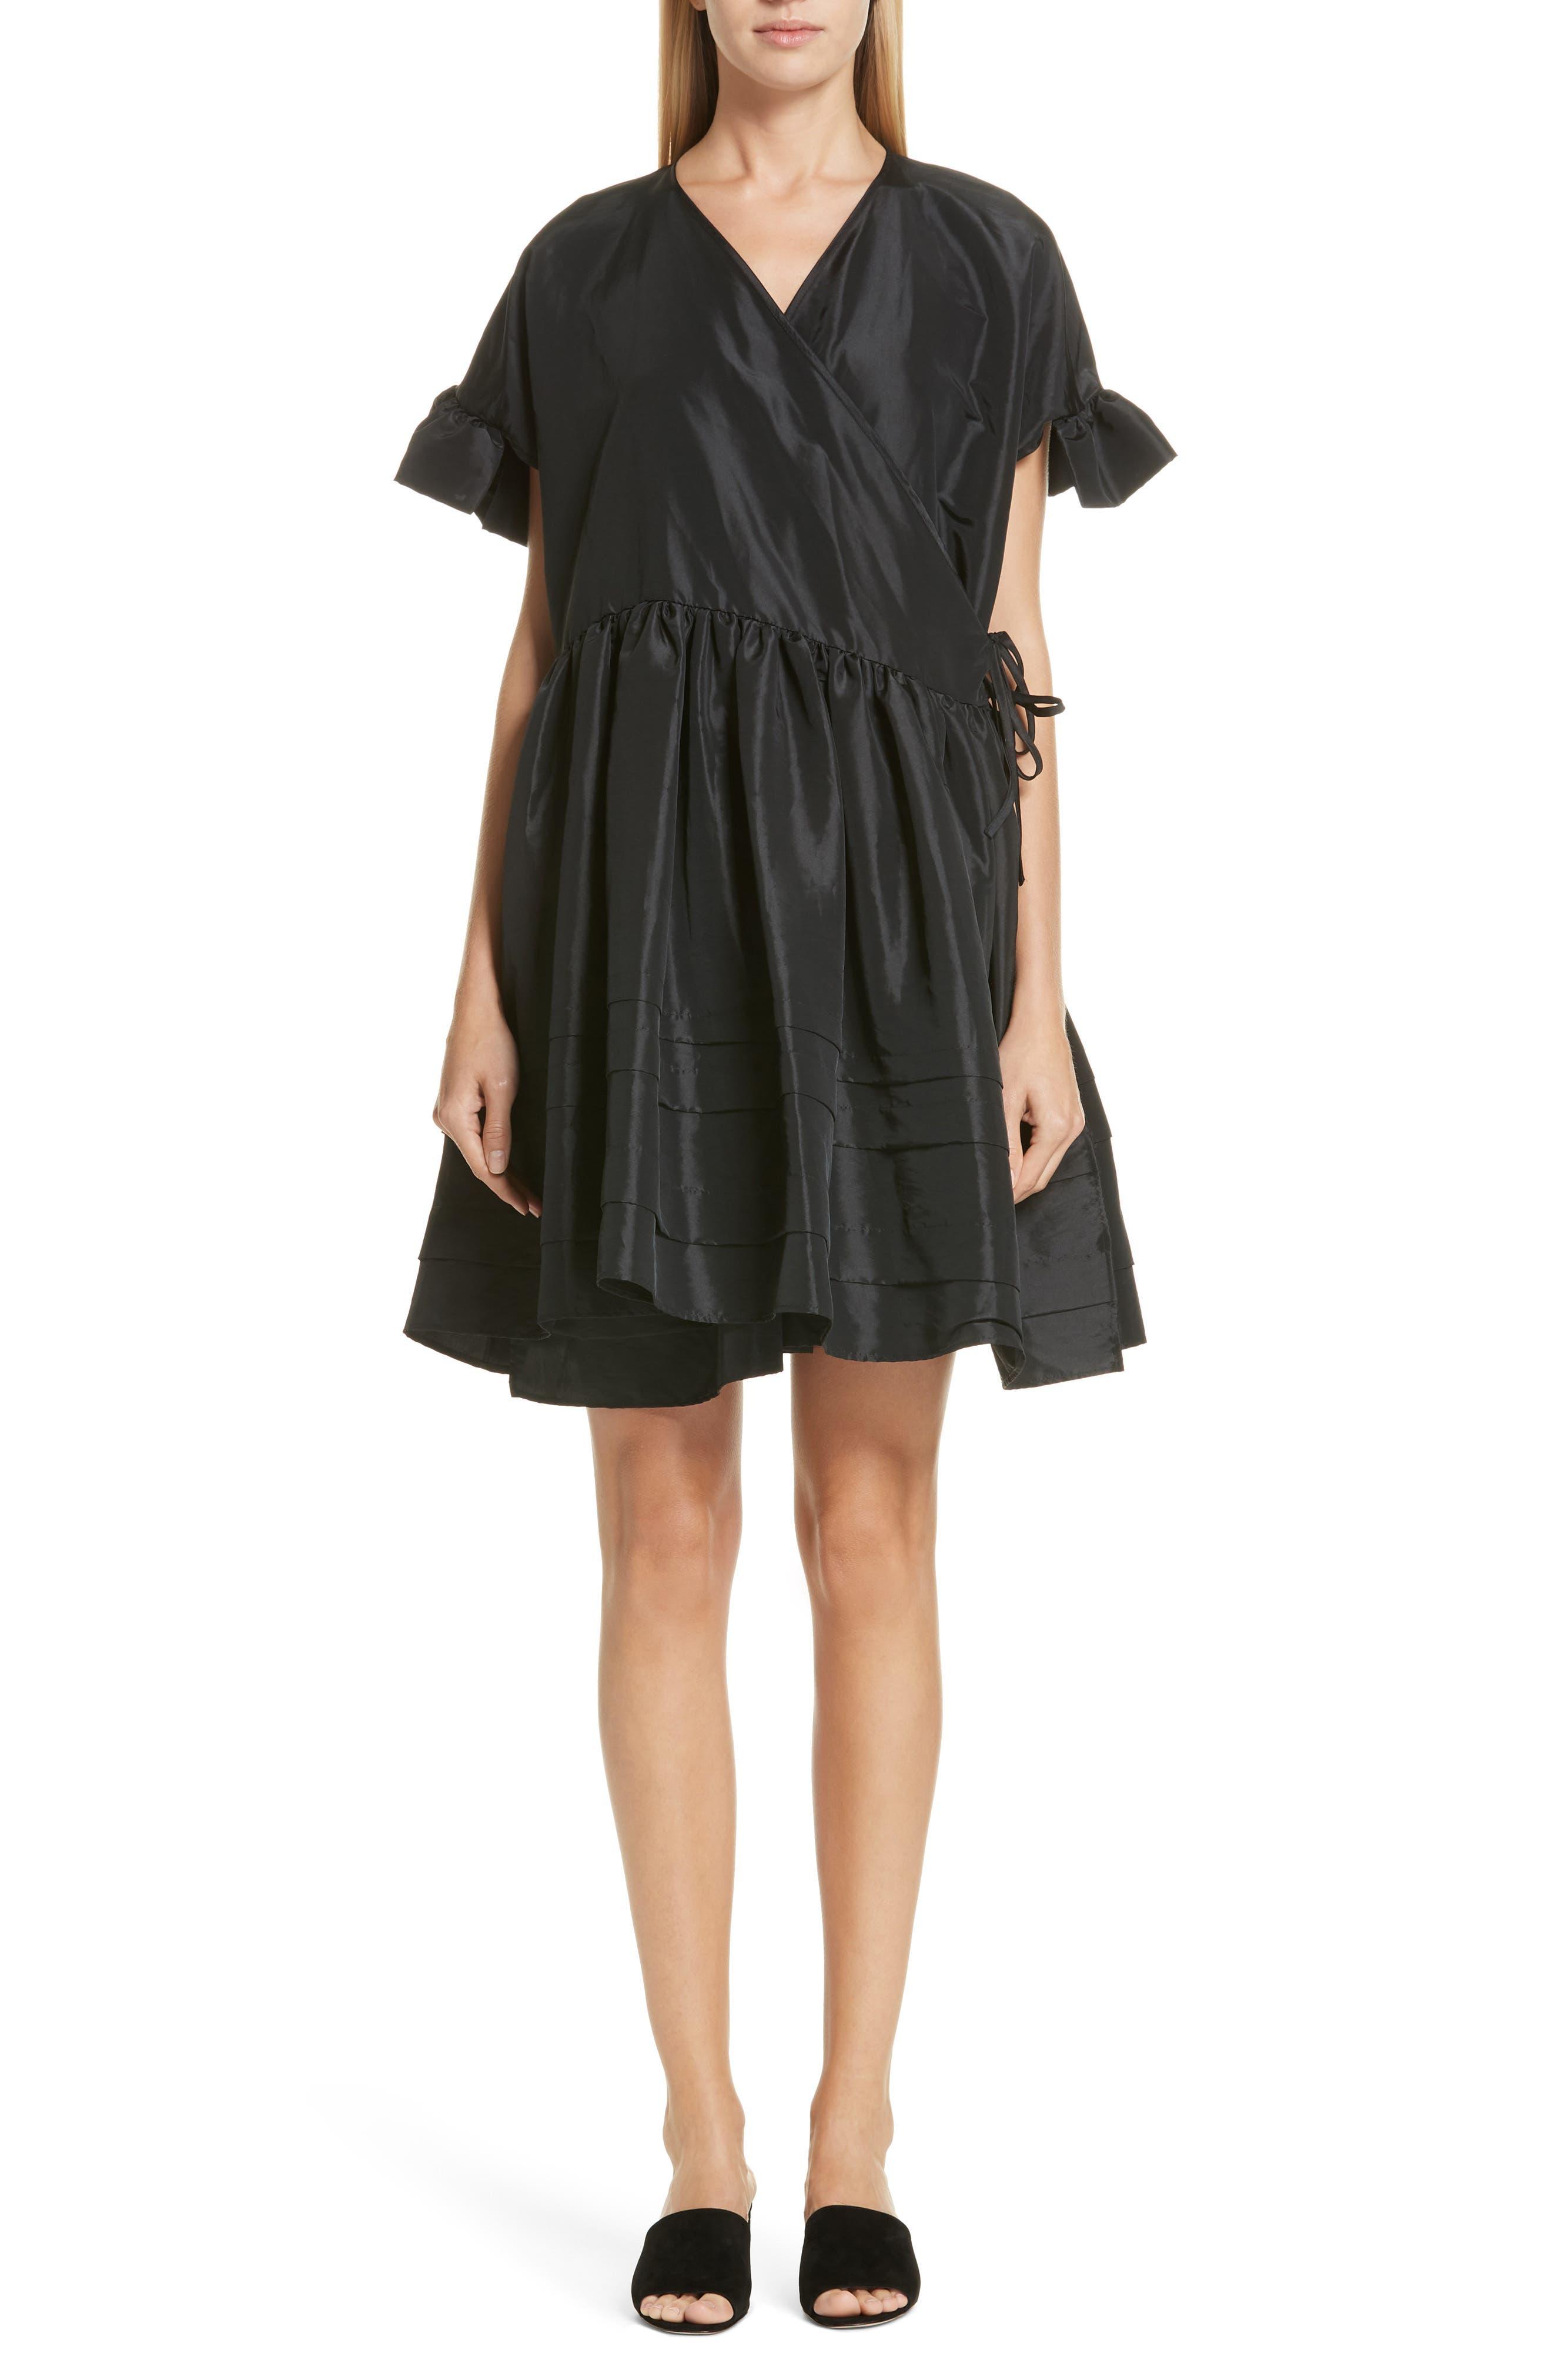 CECILIE BAHNSEN Prisca Dress in Black